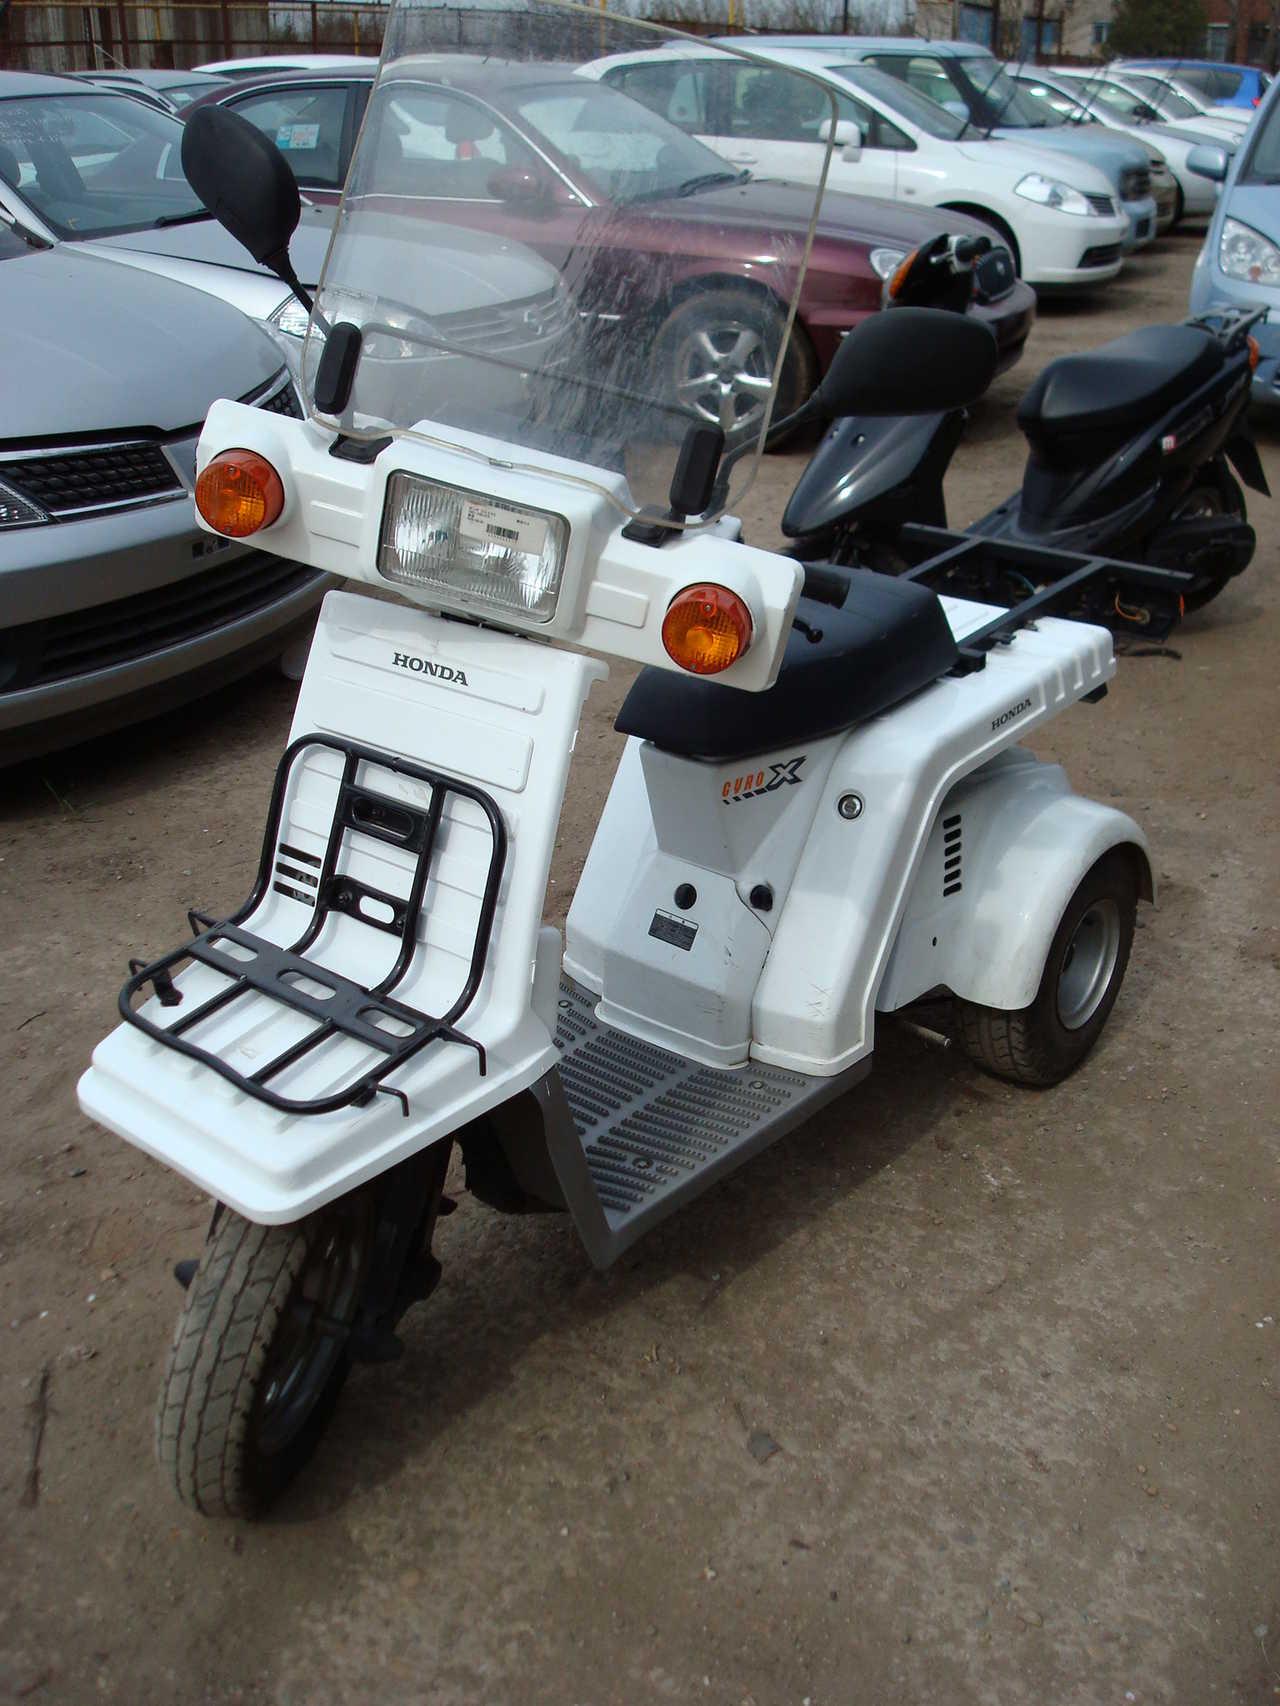 Standard Honda Gyro